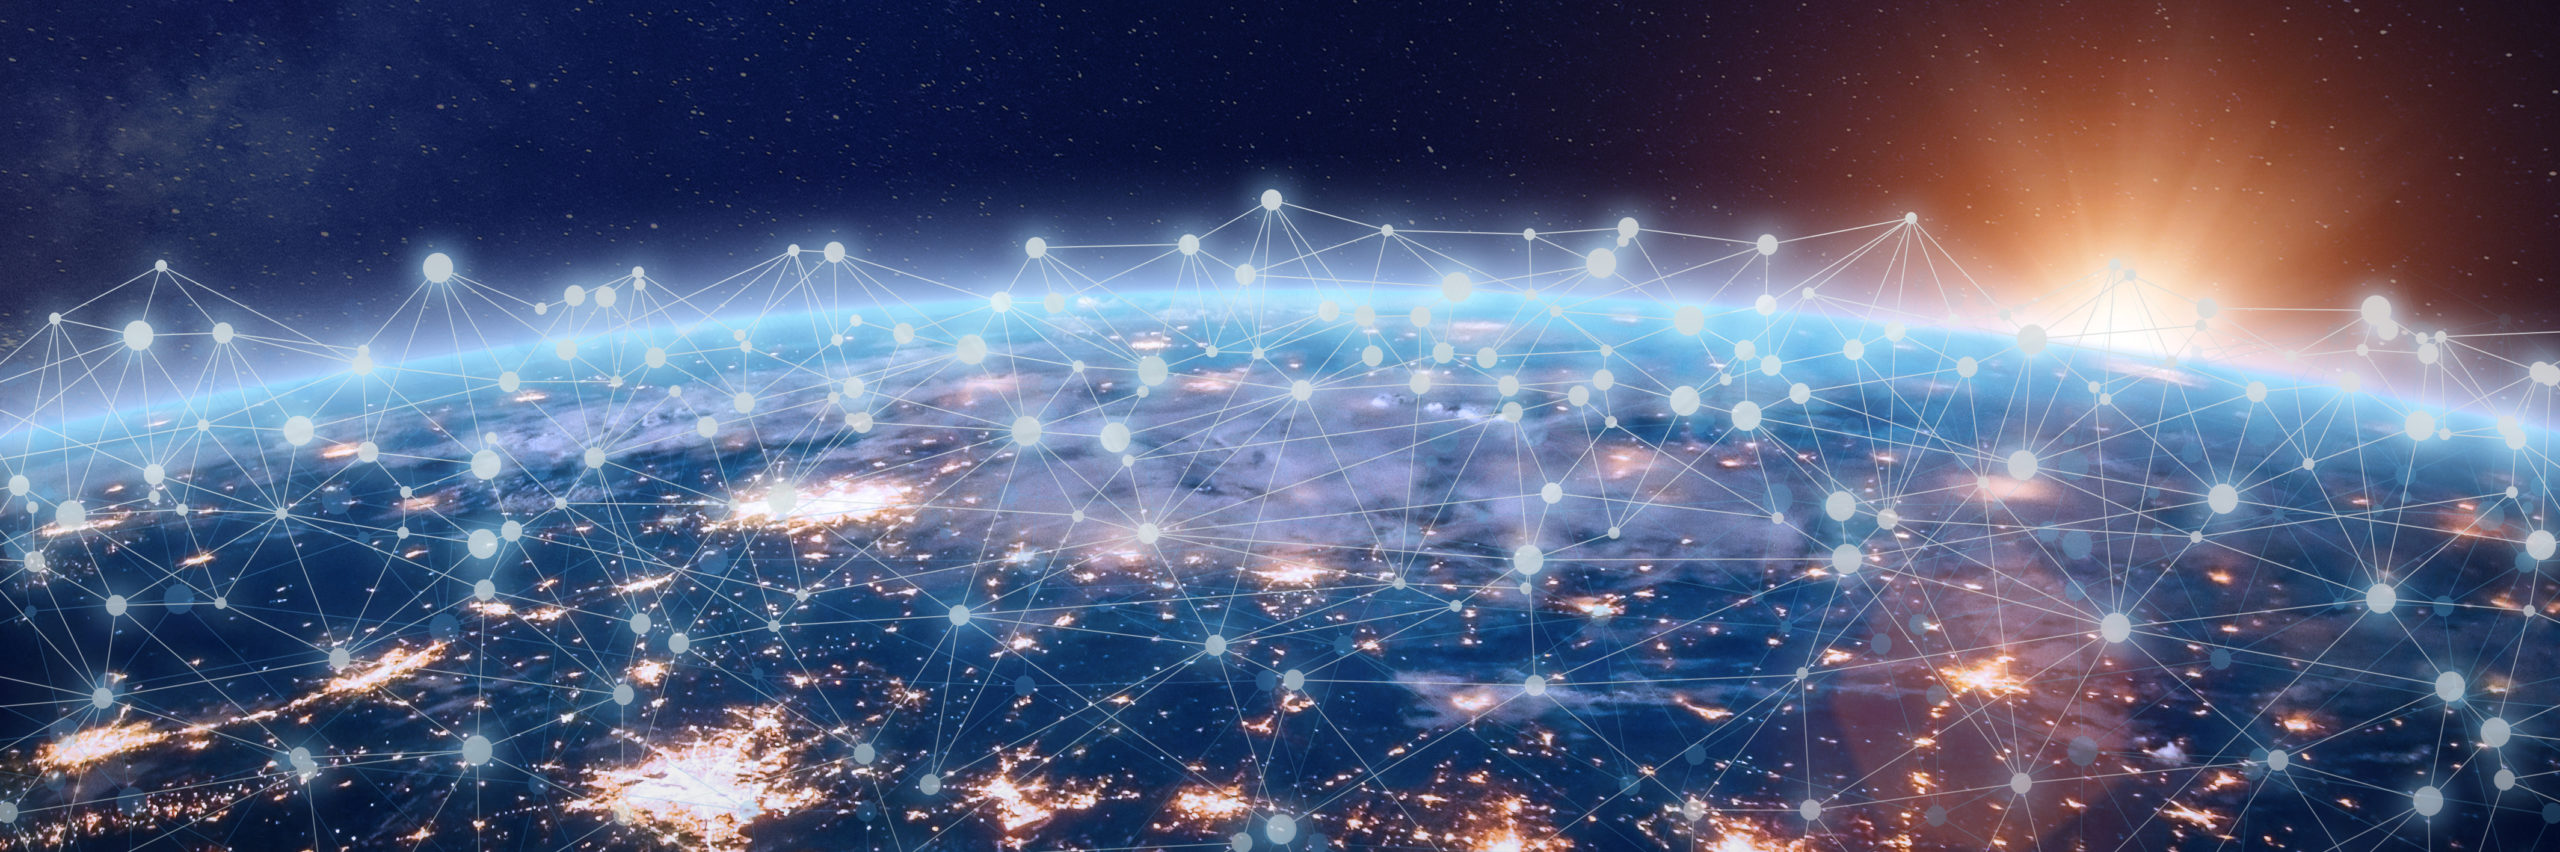 Cyber Issues Shutterstock 1089991652